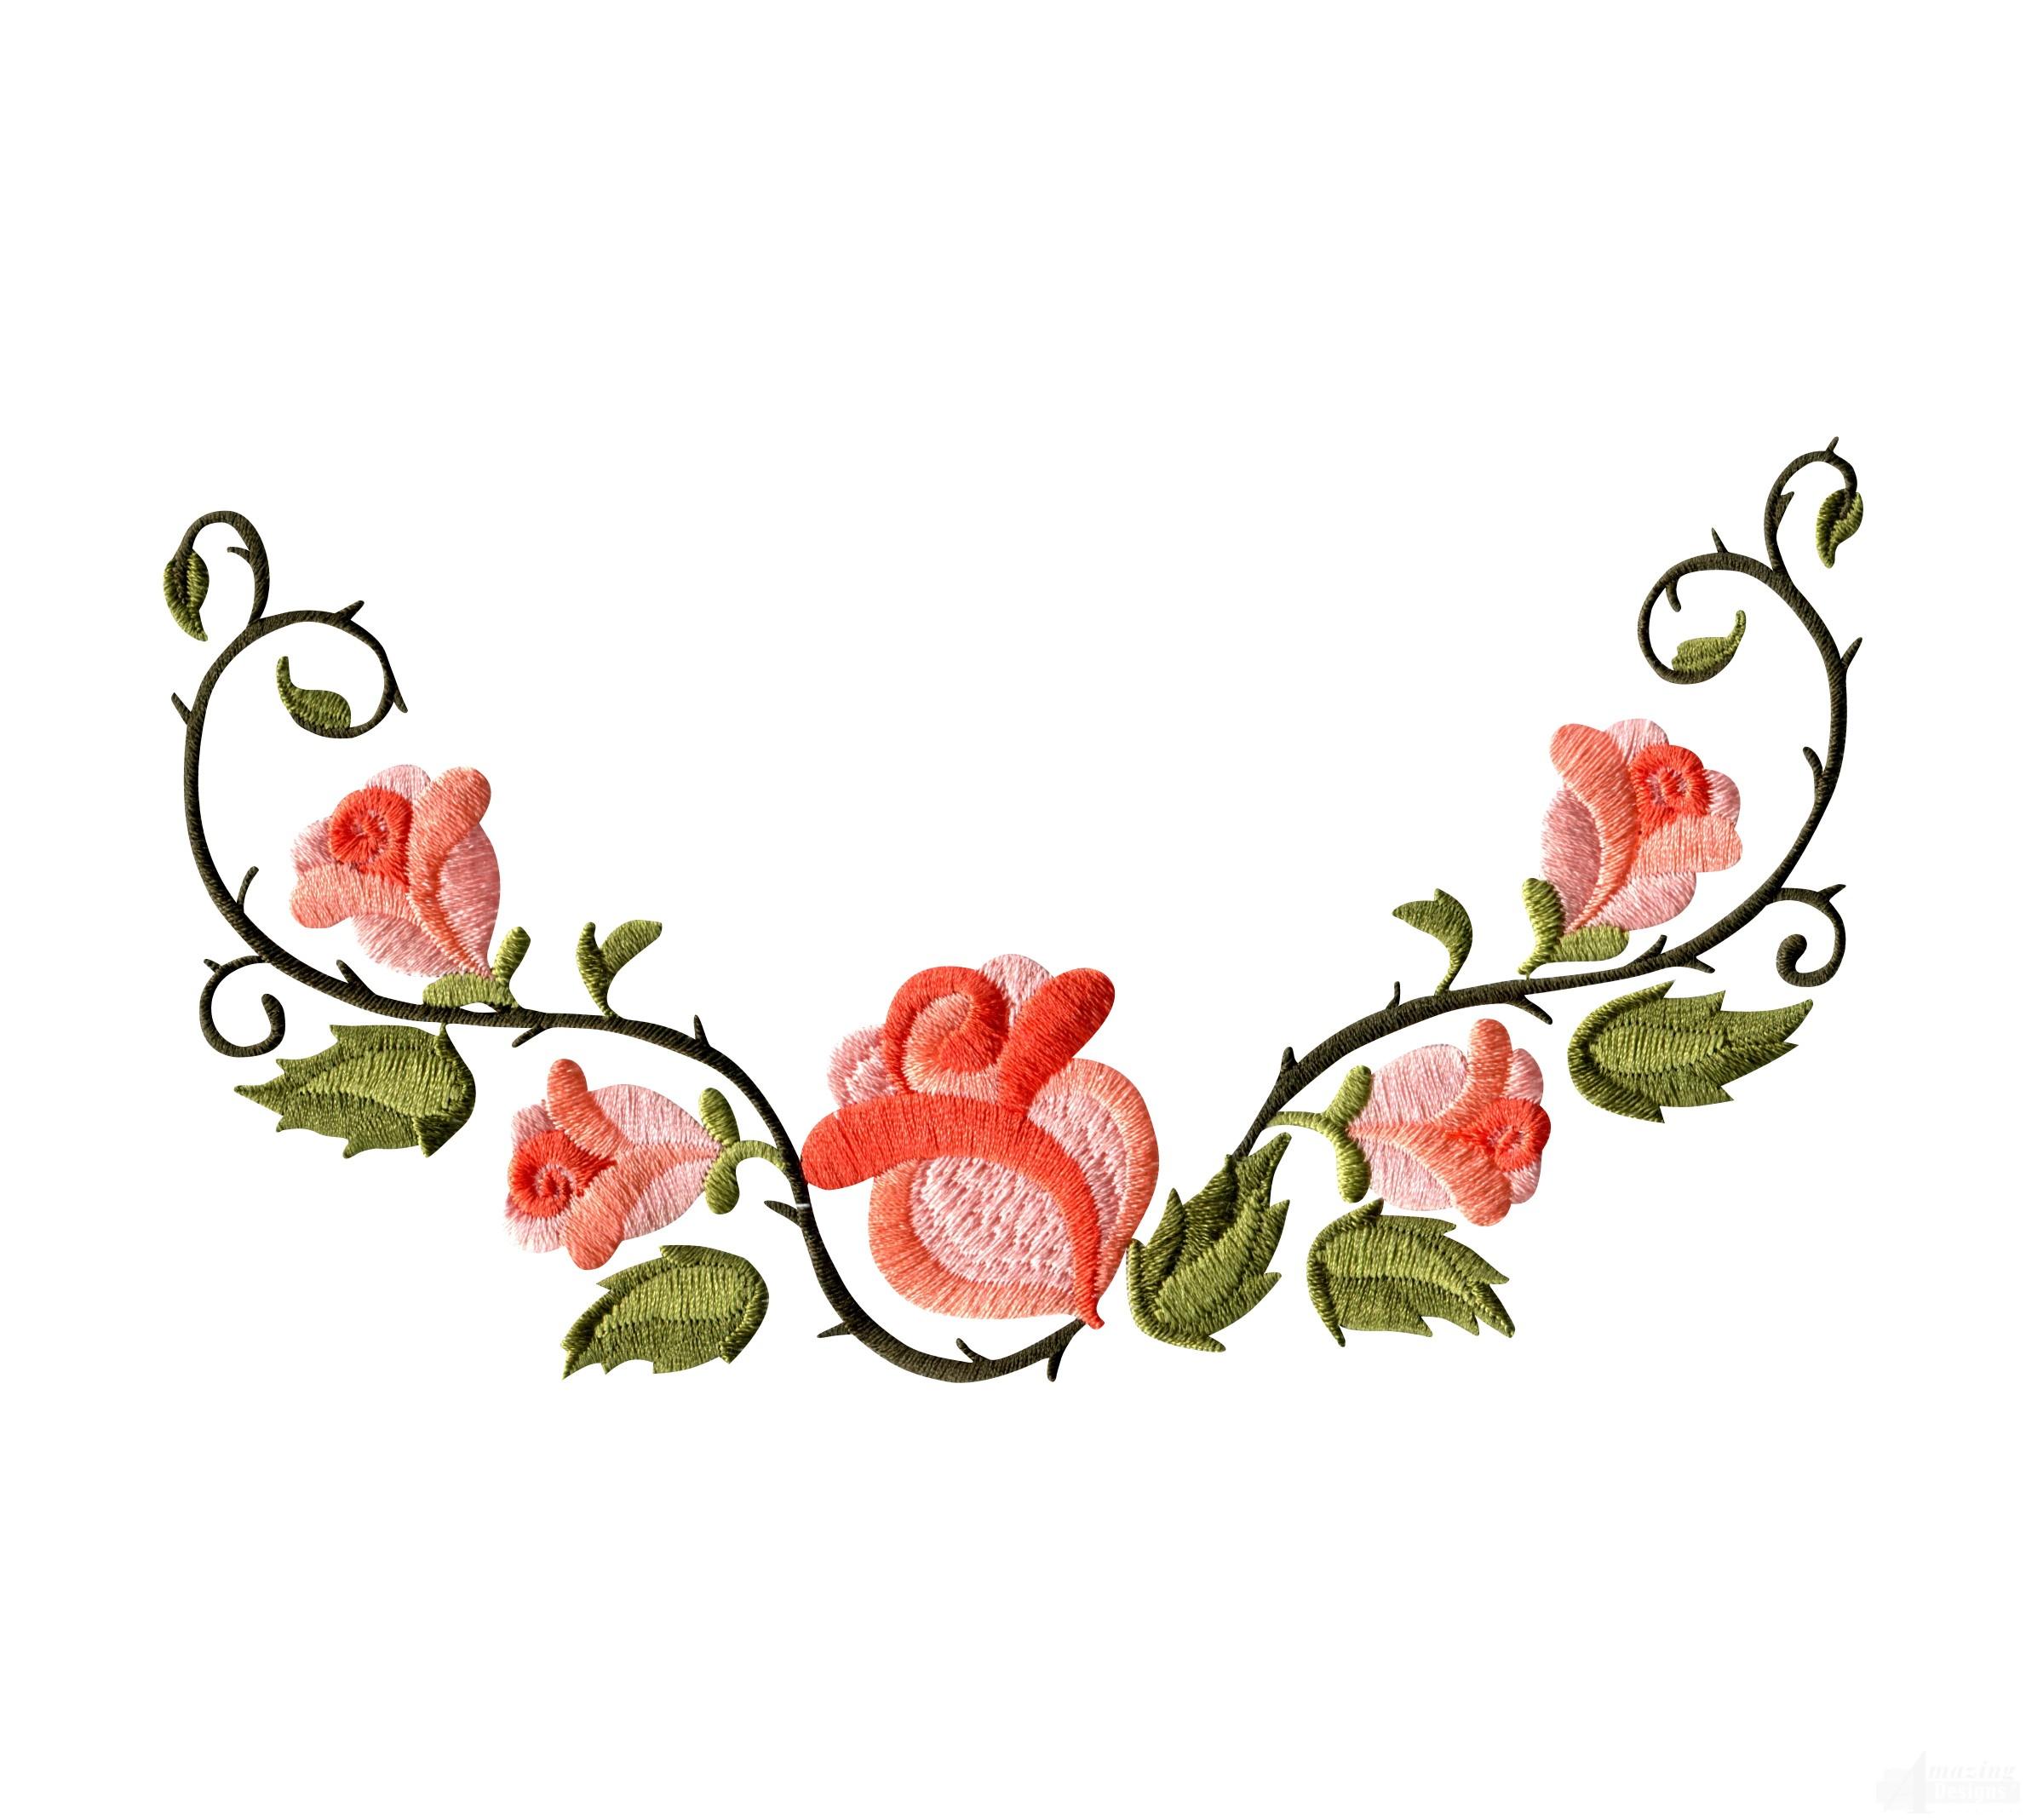 Rose flower border clipart clip art transparent stock Free Rose Flower Borders, Download Free Clip Art, Free Clip ... clip art transparent stock